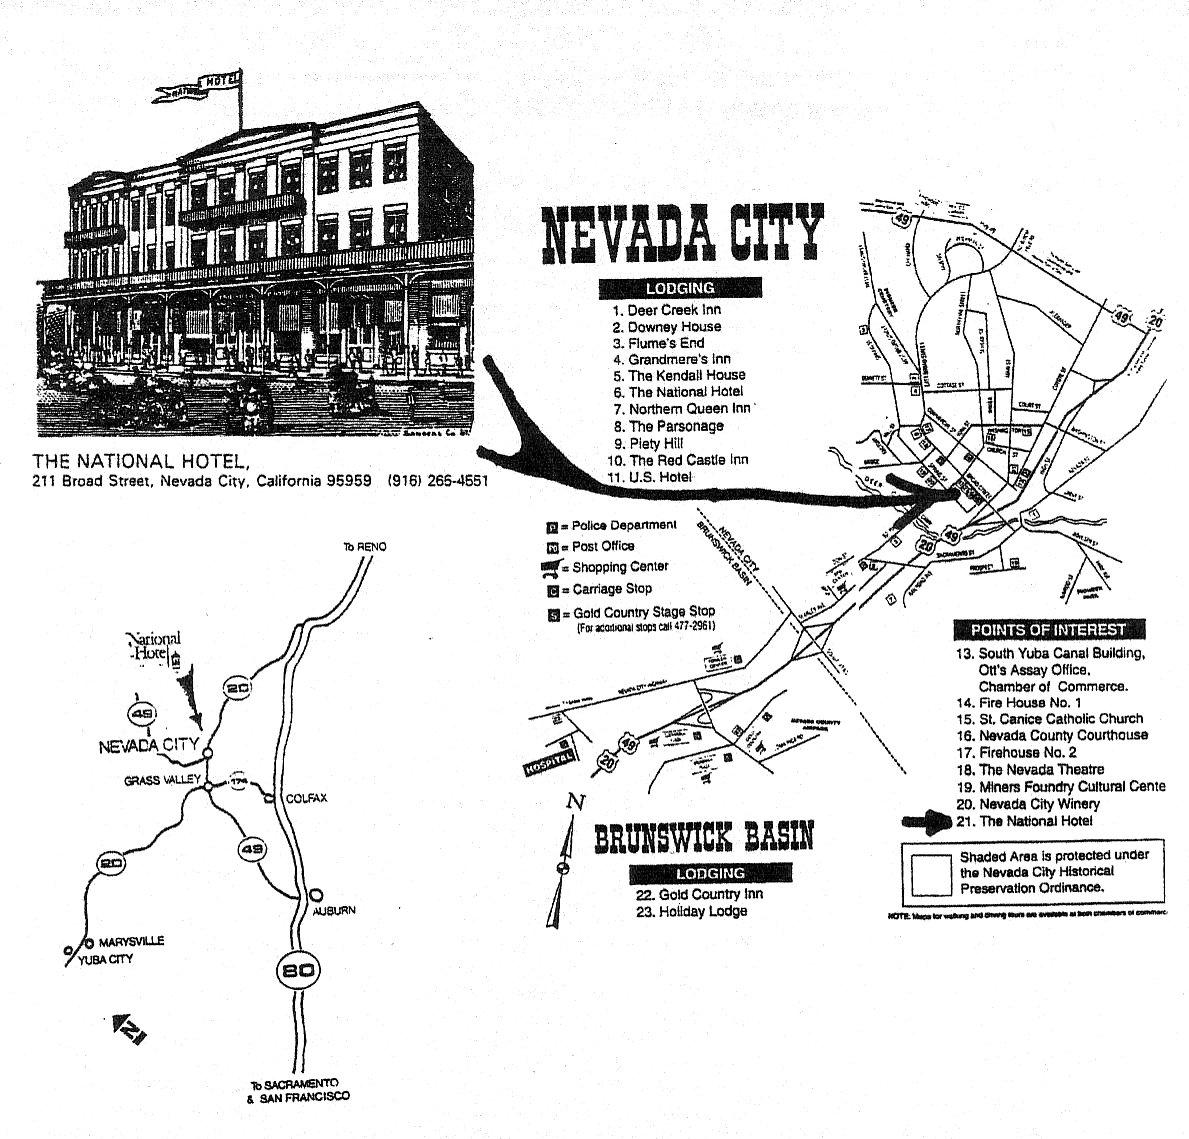 Nevada City Mine Tours - Nevada city map